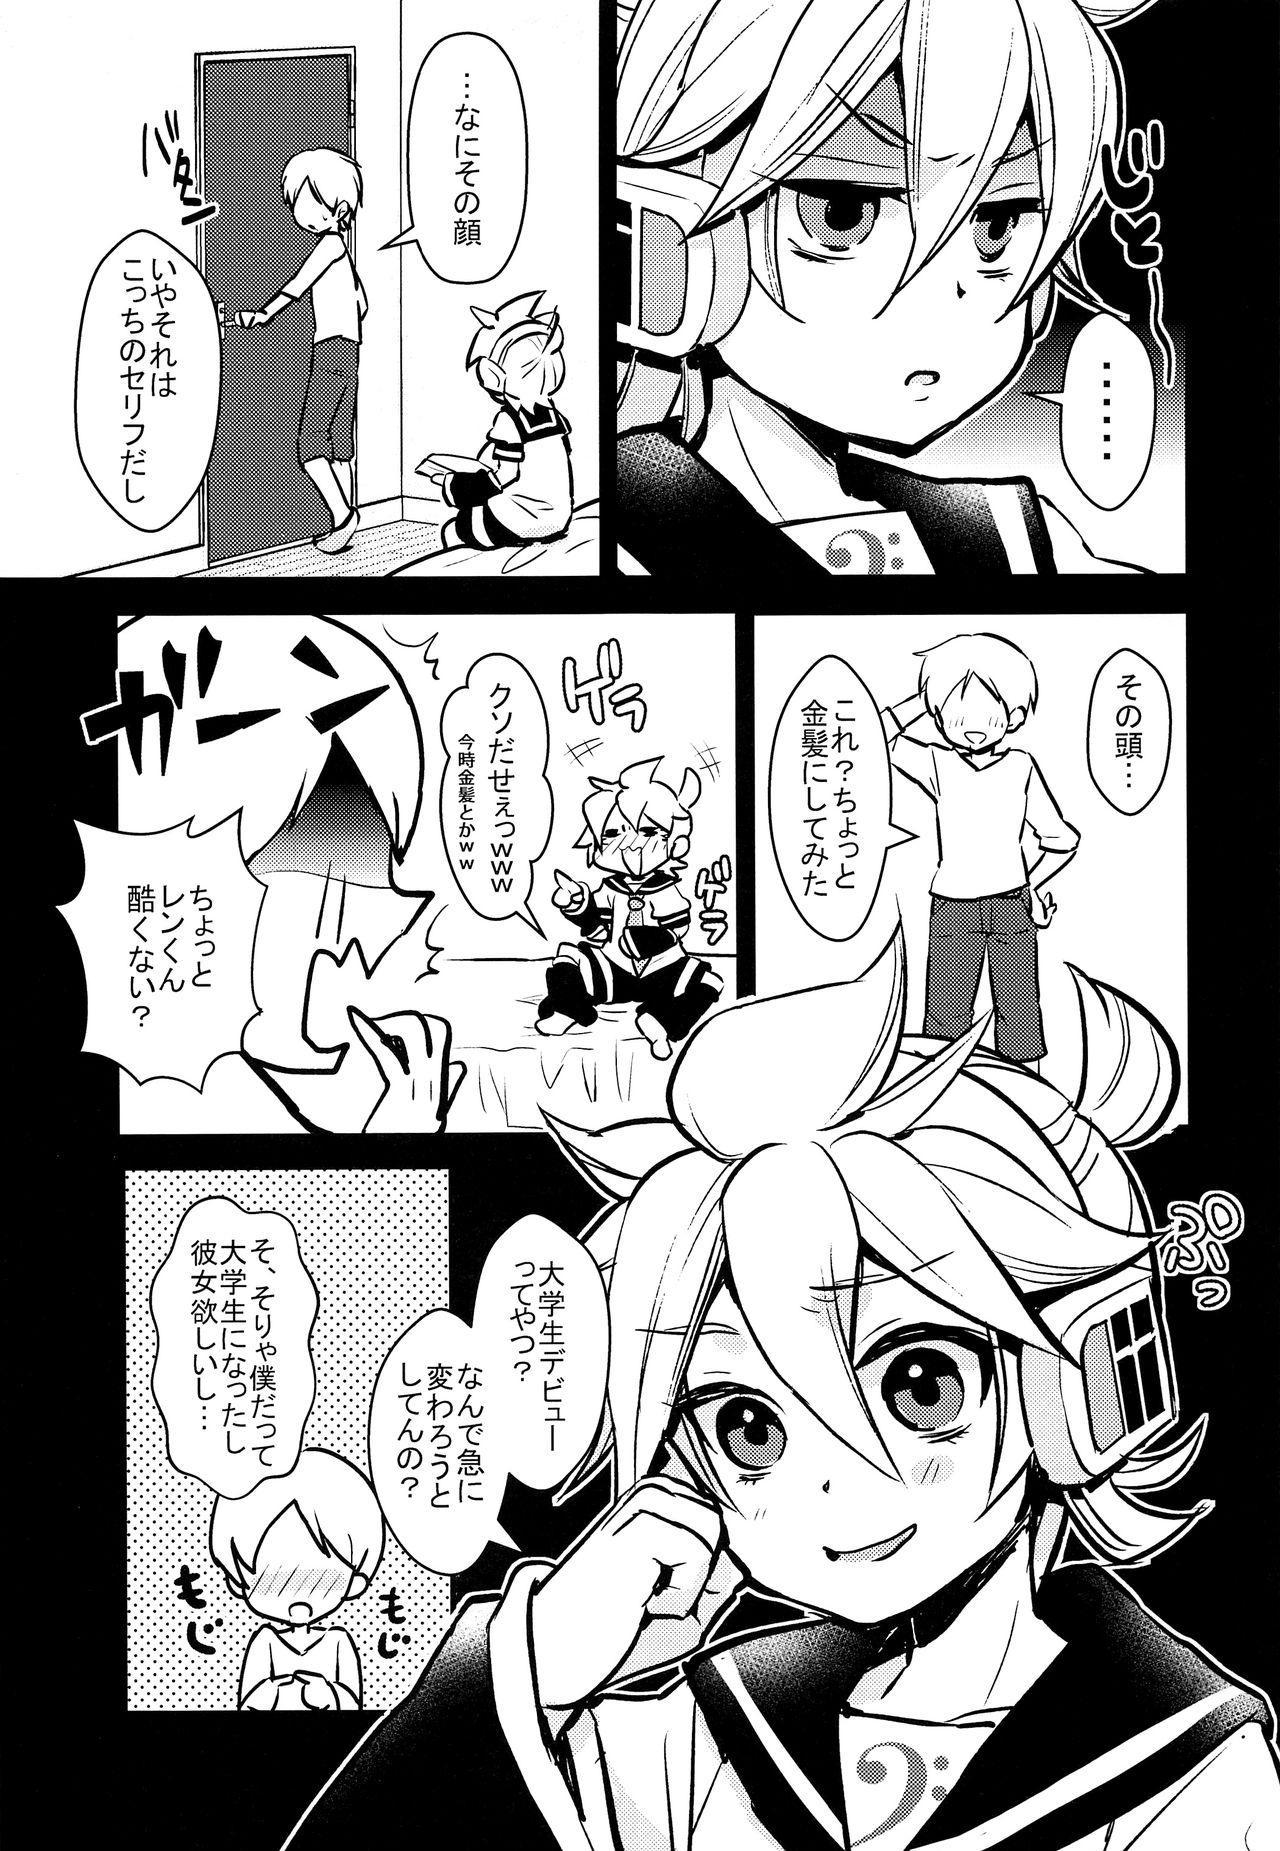 Len-kun Onegai! 5